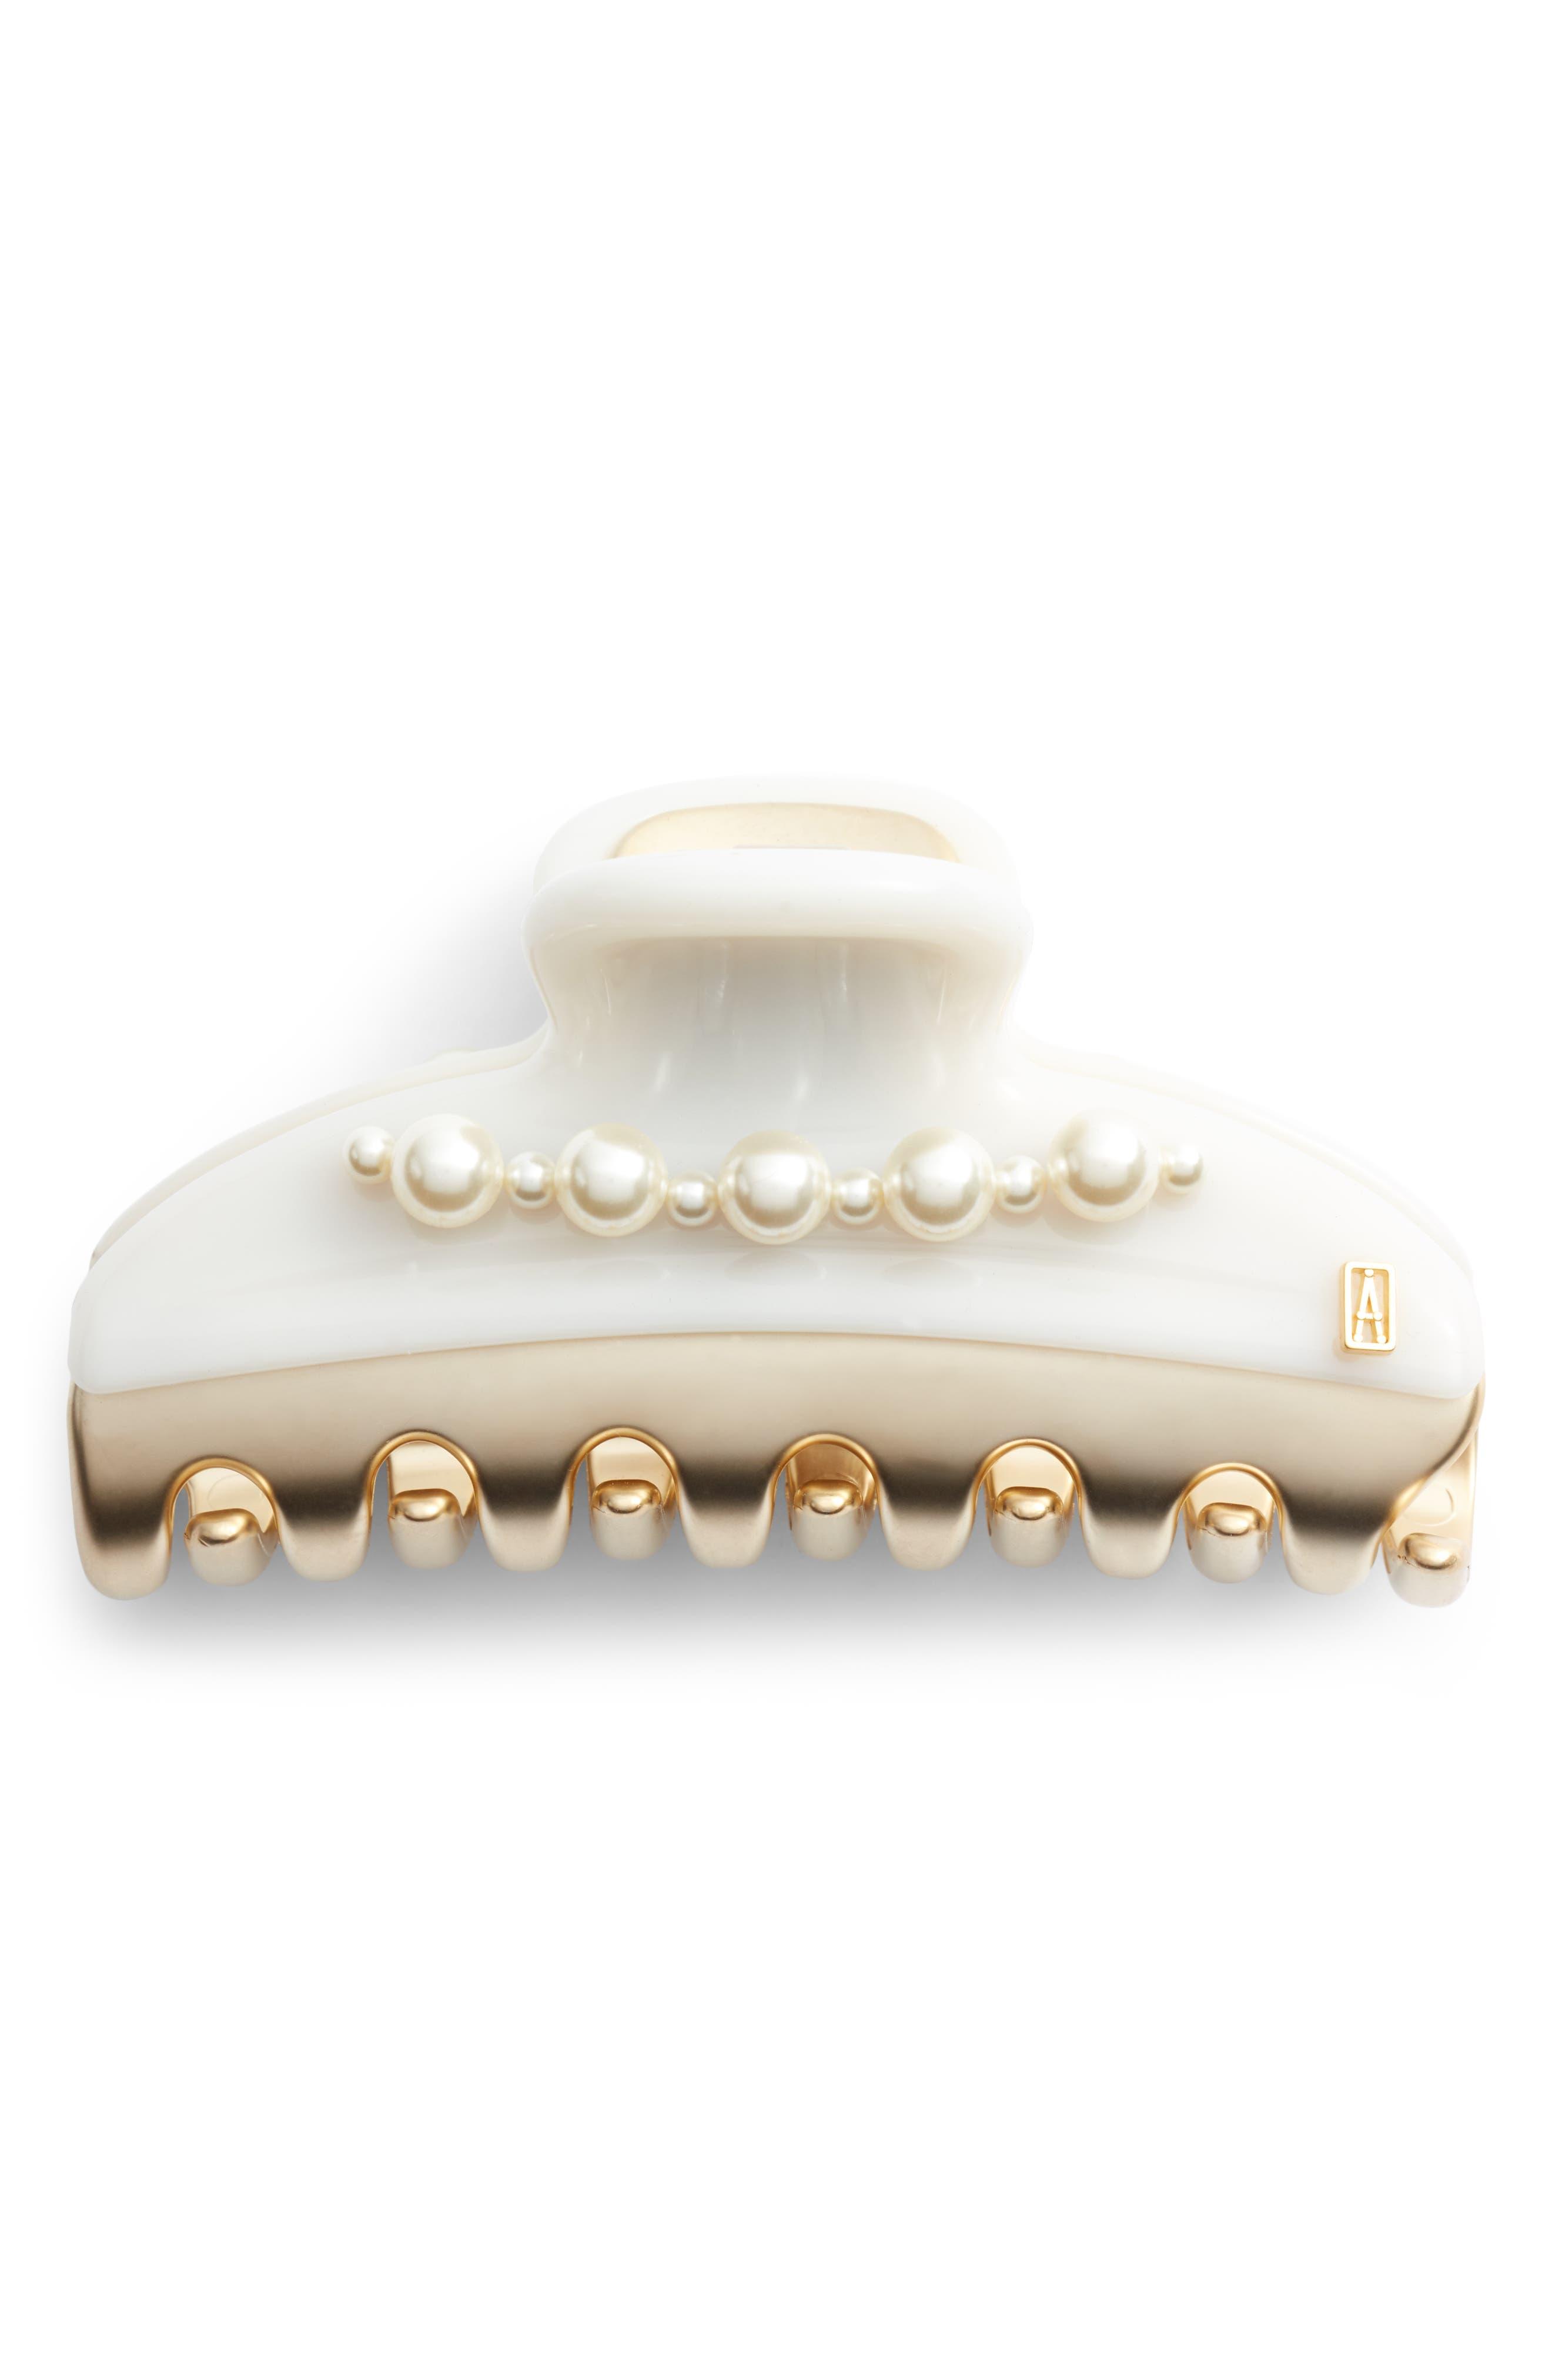 Vendome Imitation Pearl Embellished Hair Clip